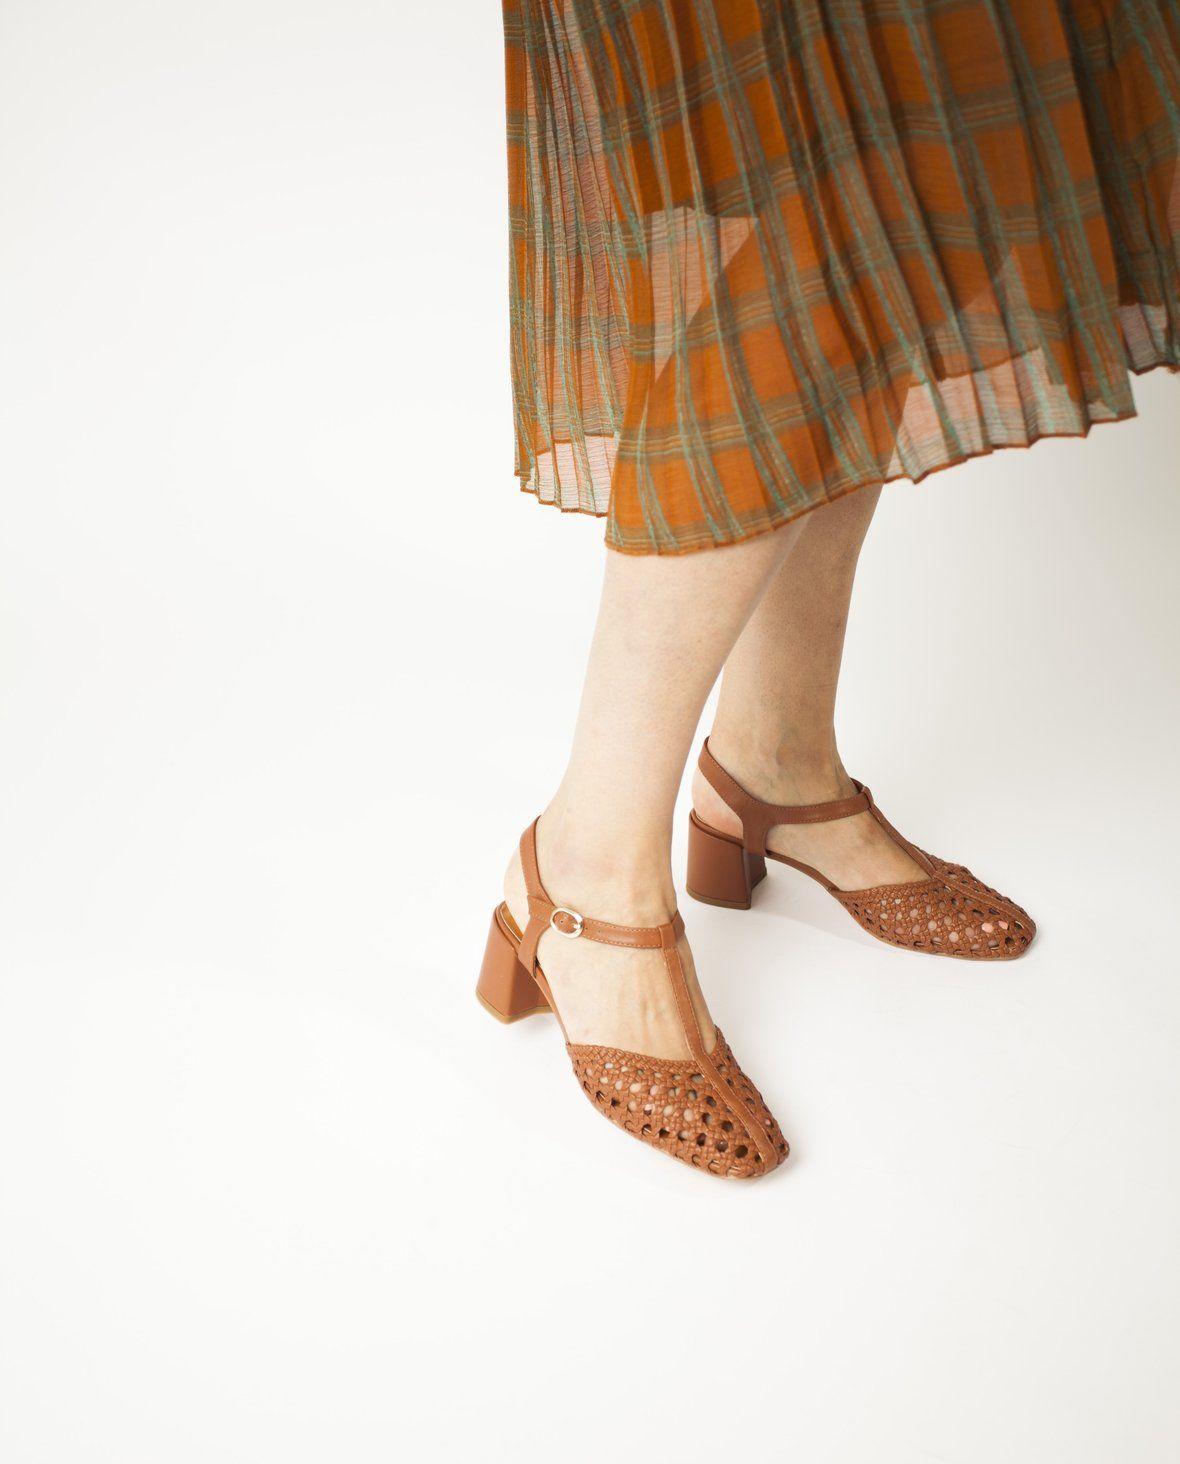 2 Baia Vista Vala Brandy Zomp Shoez In 2020 Woven Sandals Ankle Strap